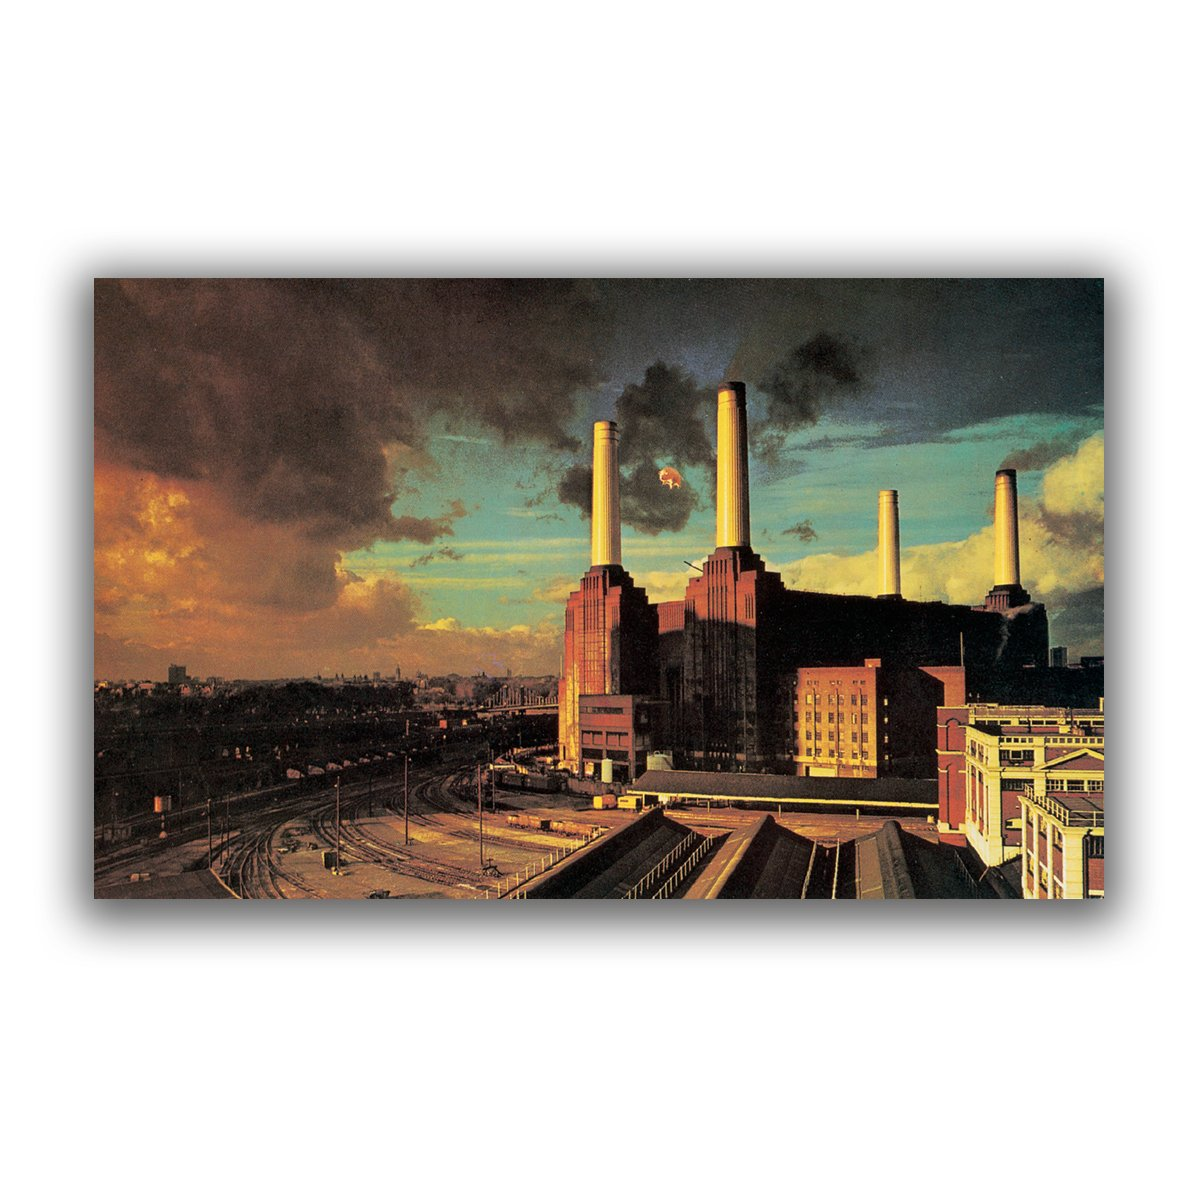 Get Down Art Animals Fly Canvas Artwork, 24 x 36 Inches (PFPOE2-24x36)